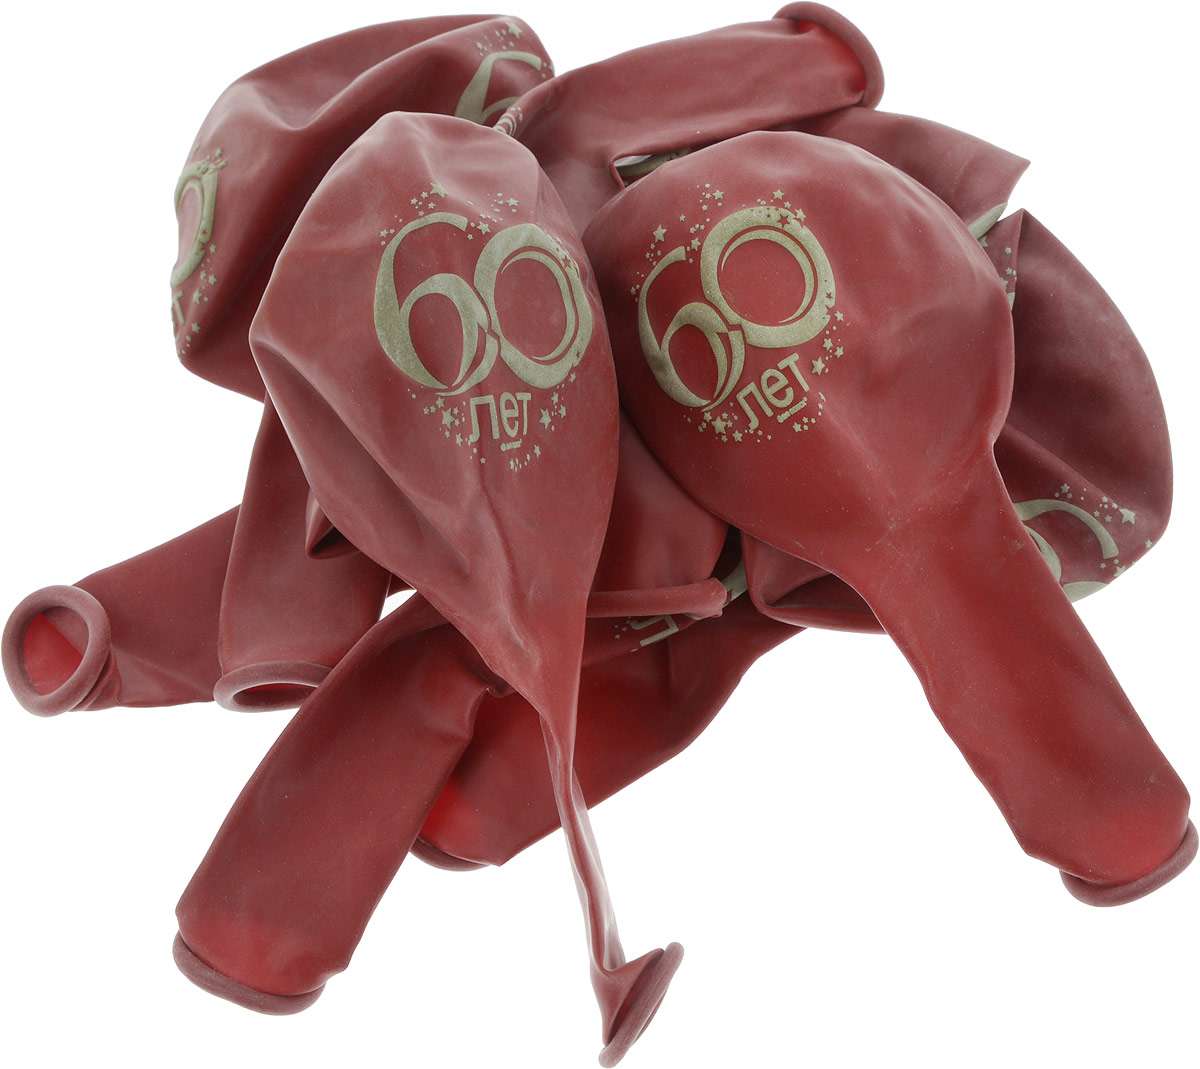 Latex Occidental Набор воздушных шариков Юбилей цифра 60 10 шт latex occidental набор воздушных шариков металлик и перламутр 50 шт